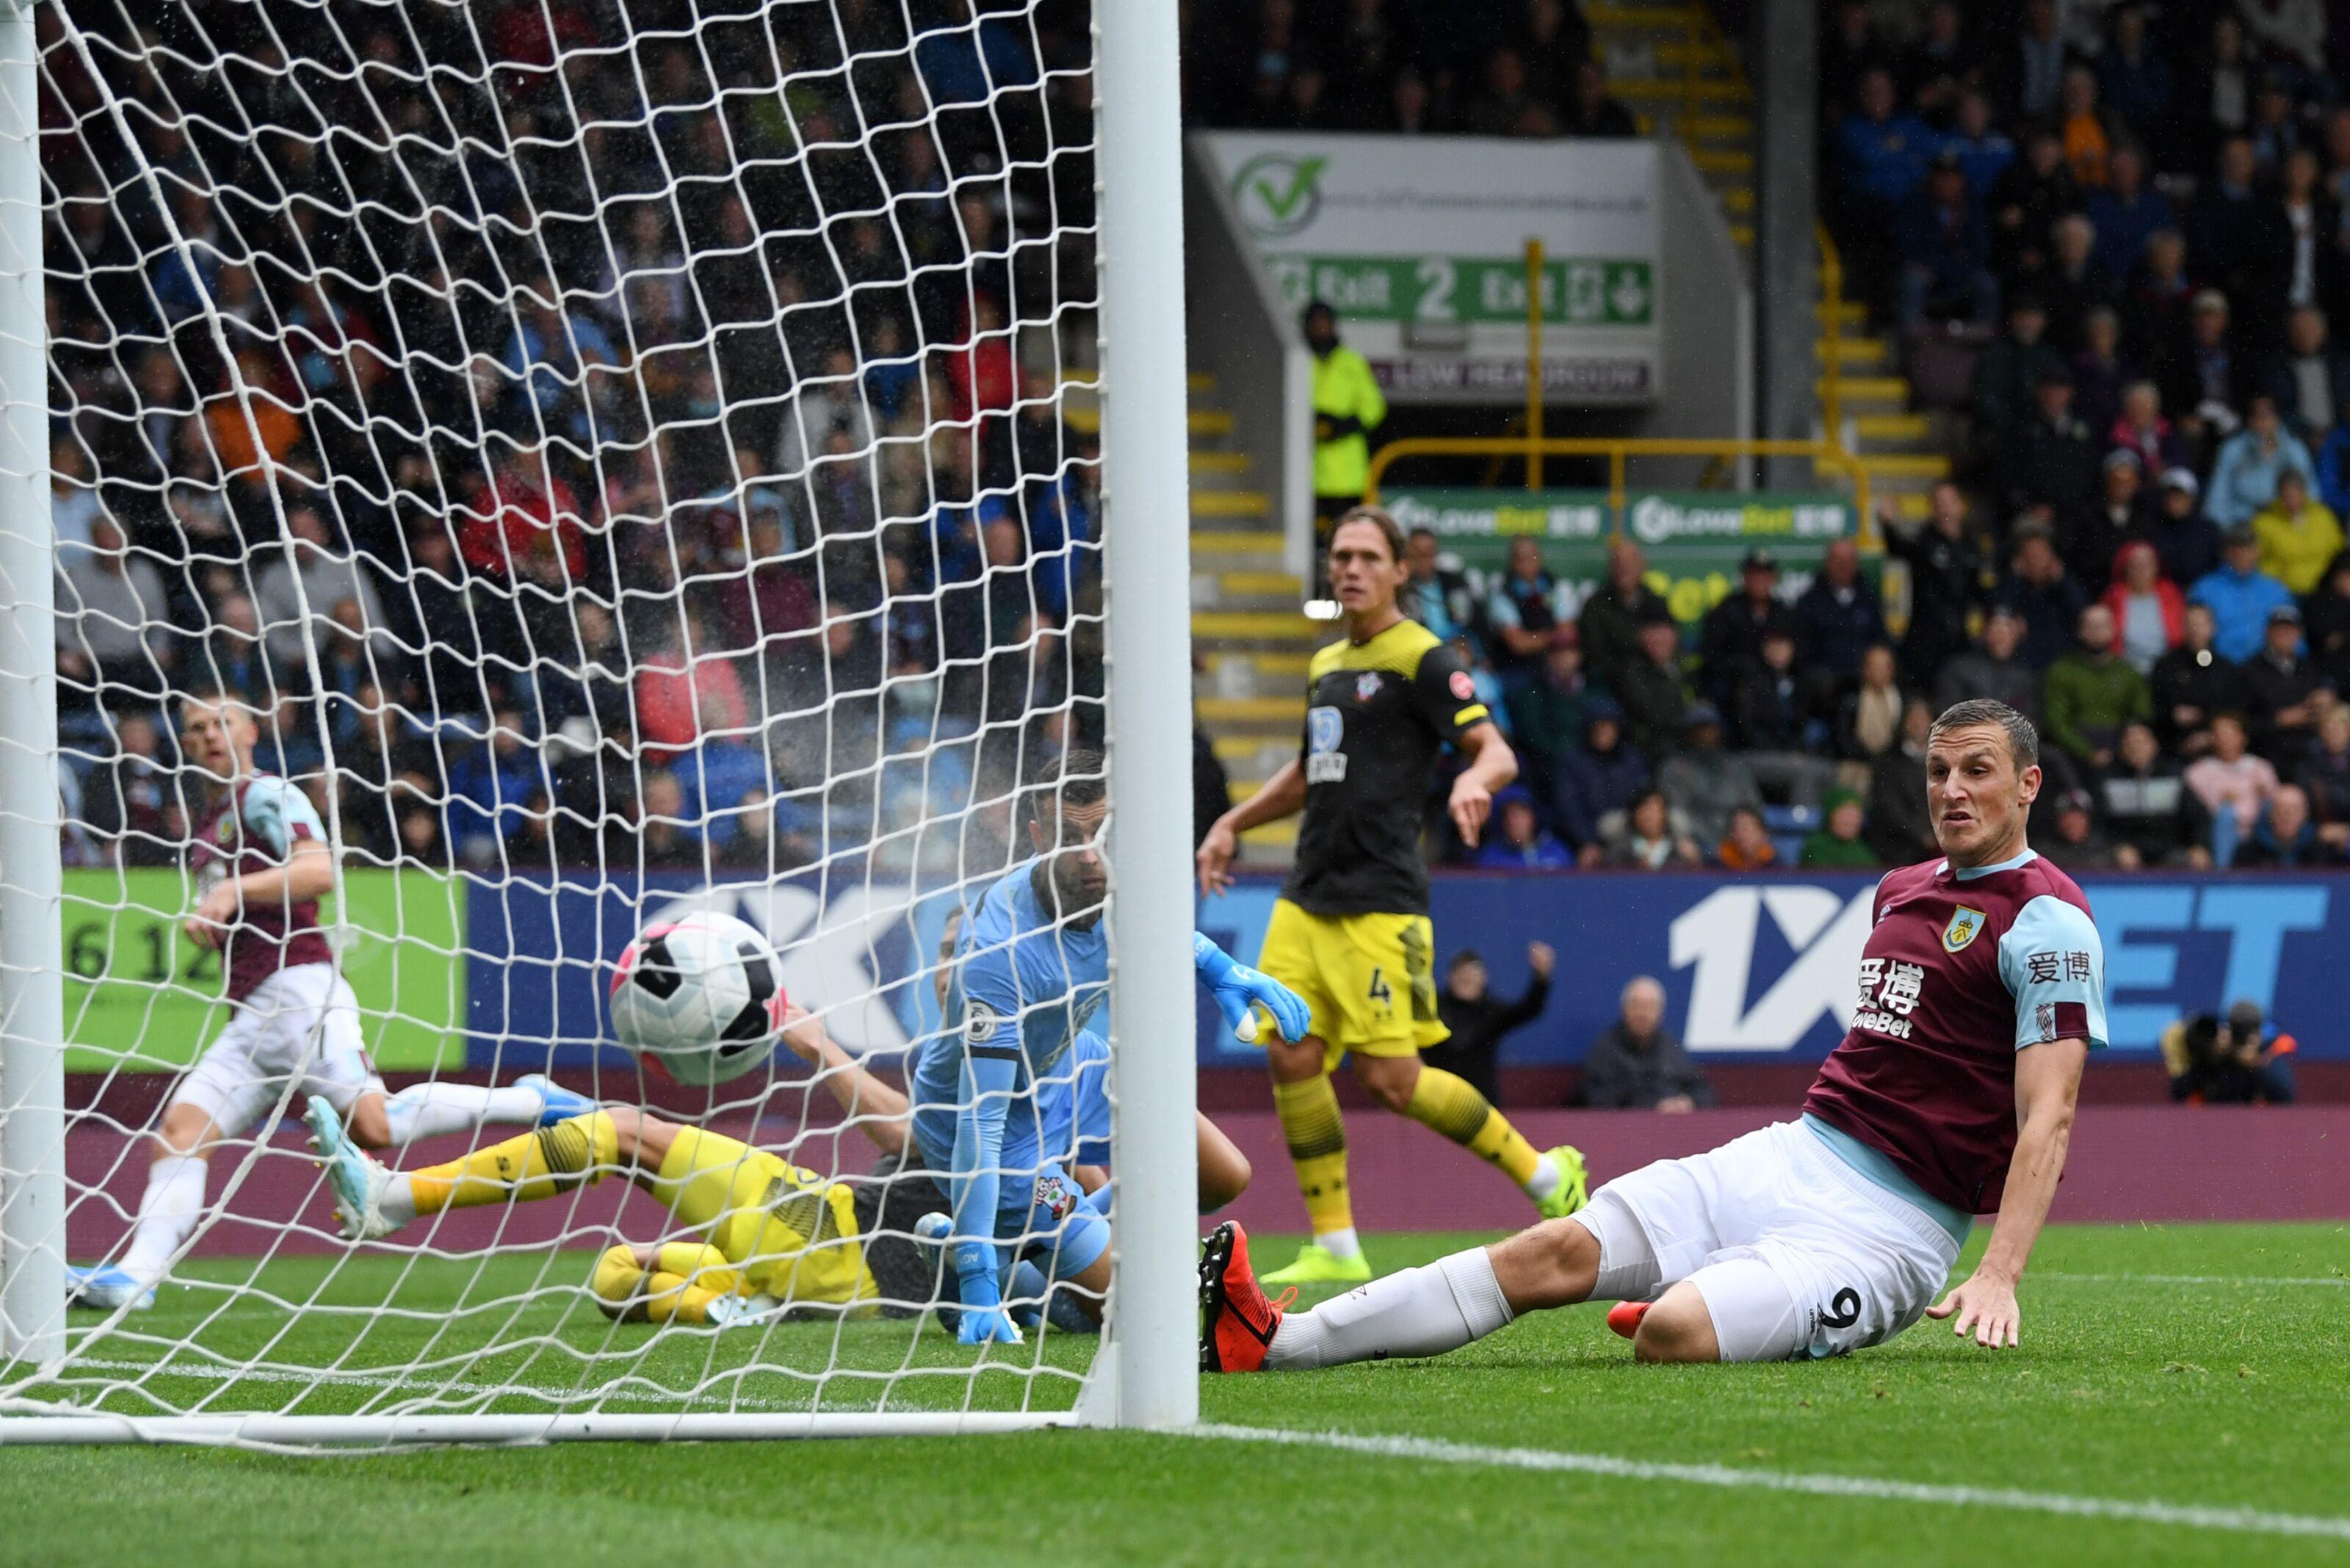 Burnley 3-0 Southampton: Saints well beaten by Clarets on opening day of Premier League season